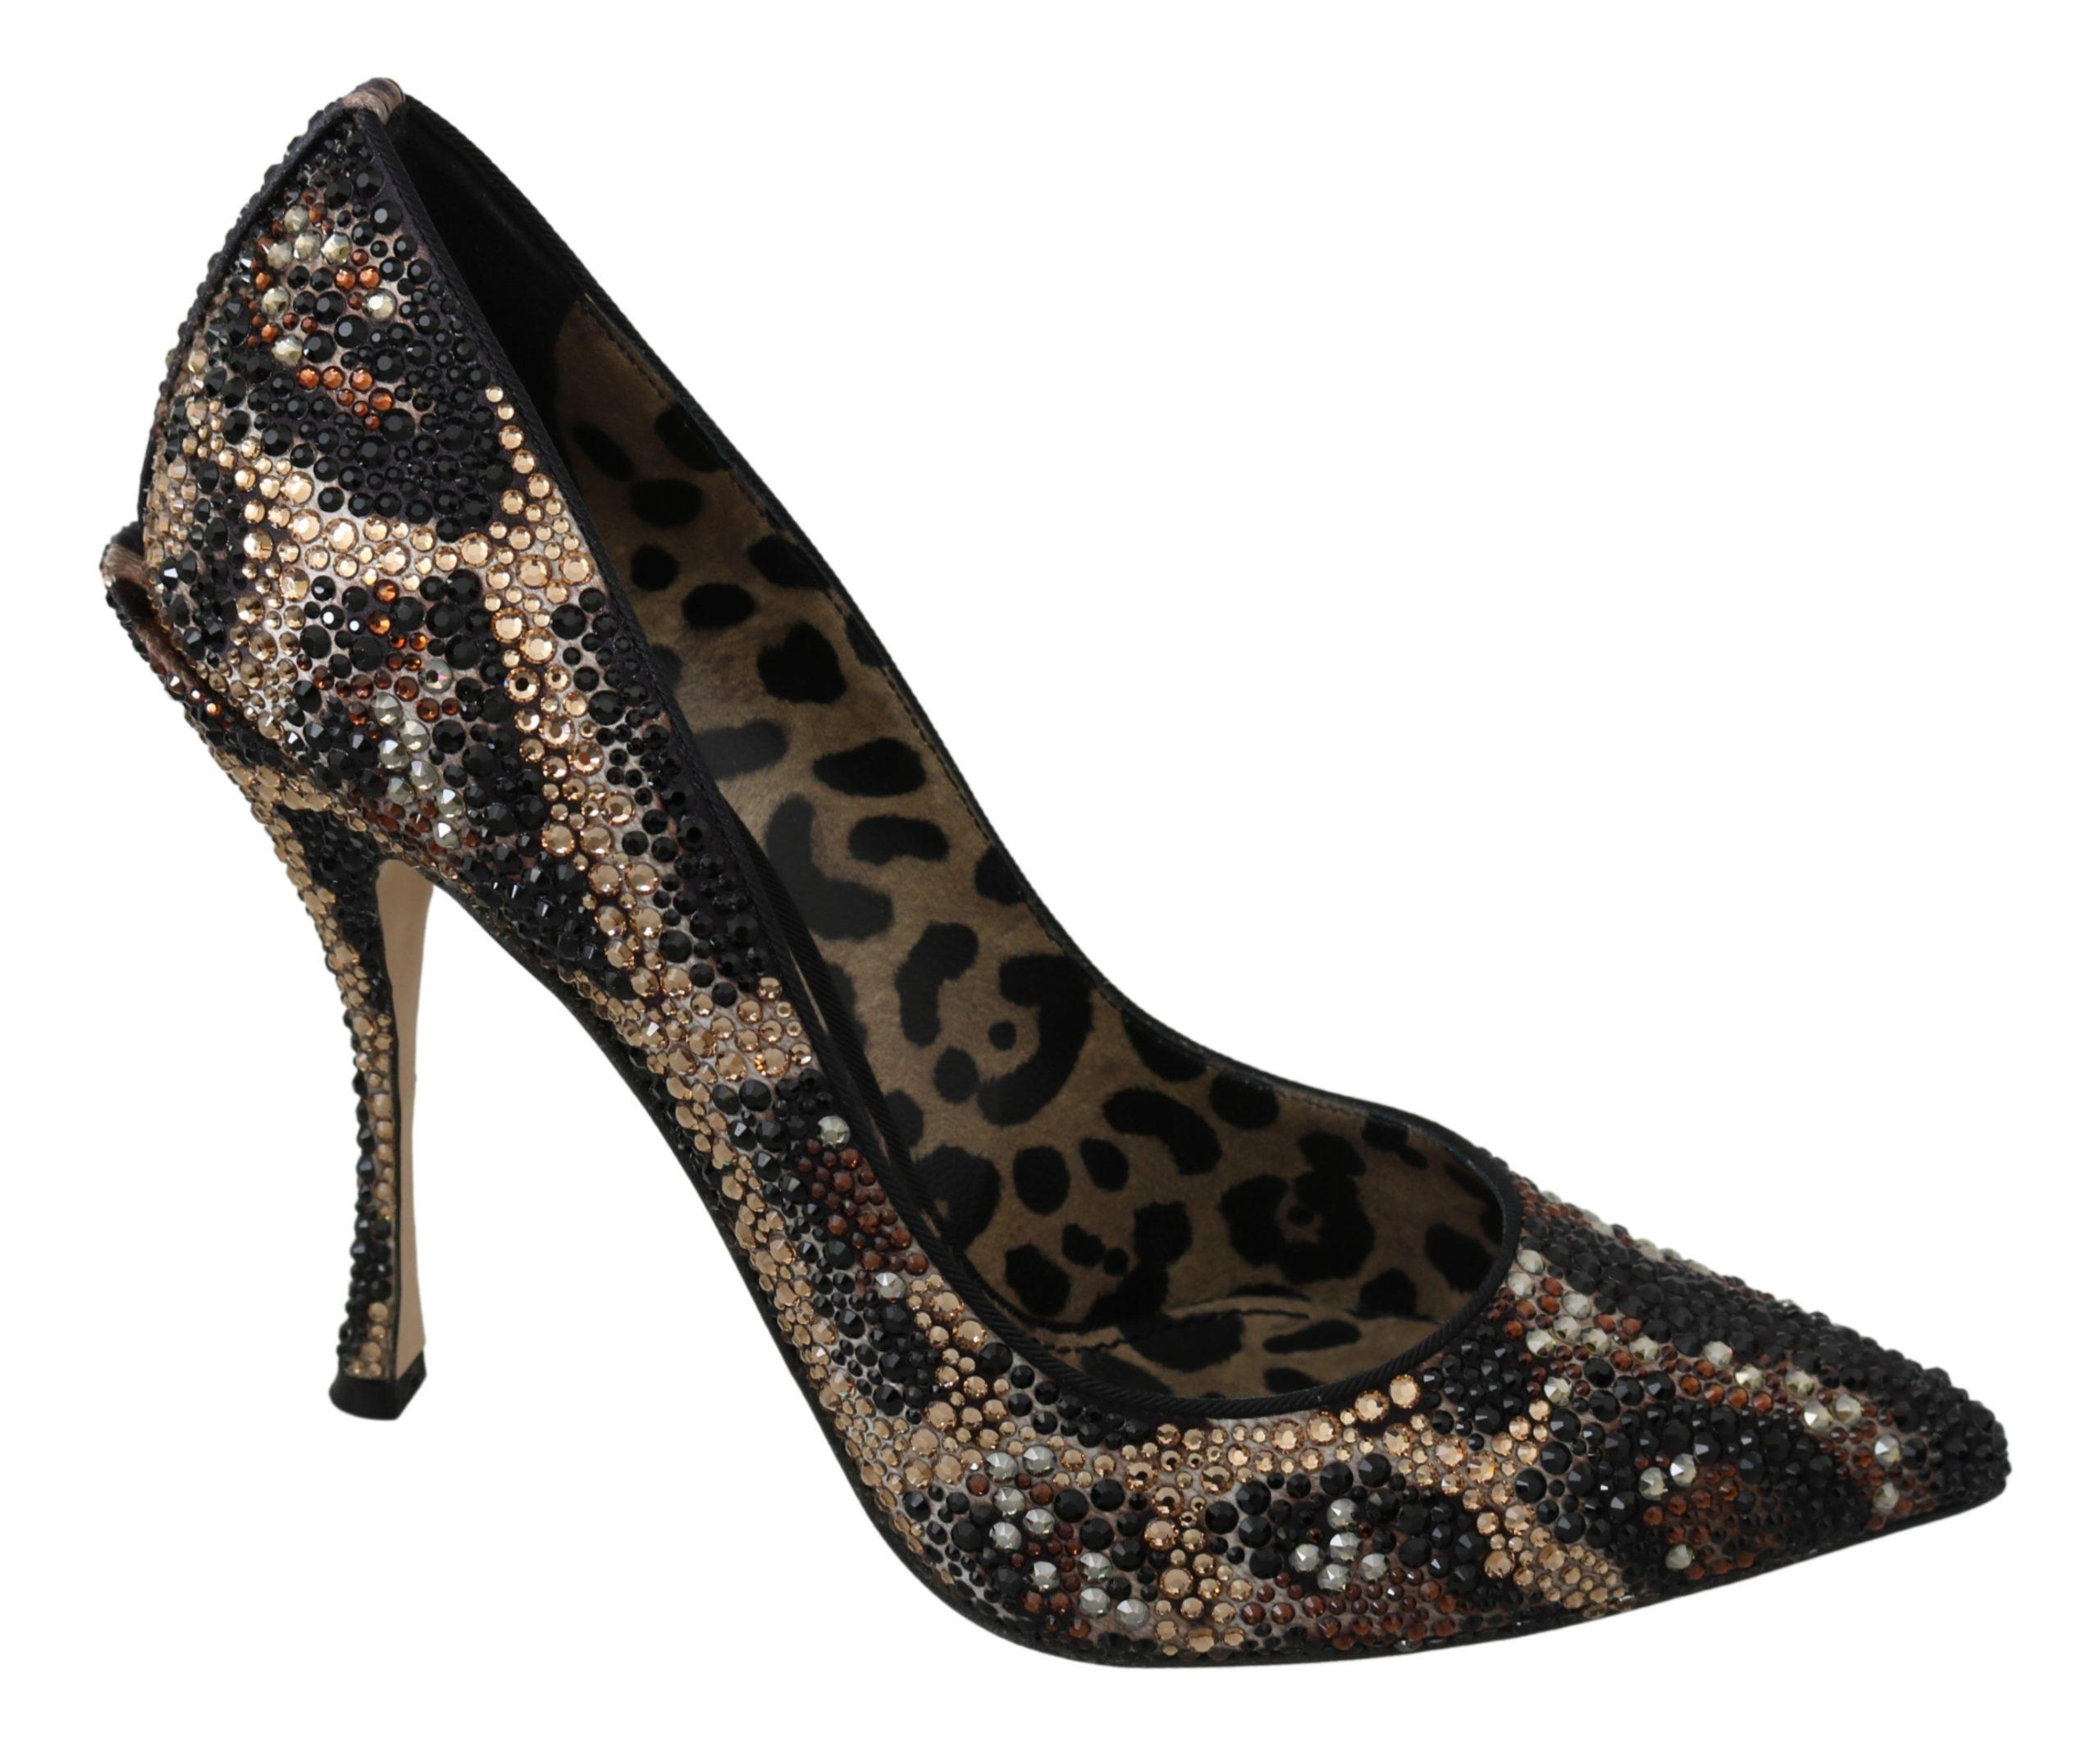 Dolce & Gabbana Women's Leopard Crystals High Heel Pumps Brown LA7125 - EU40.5/US7.5